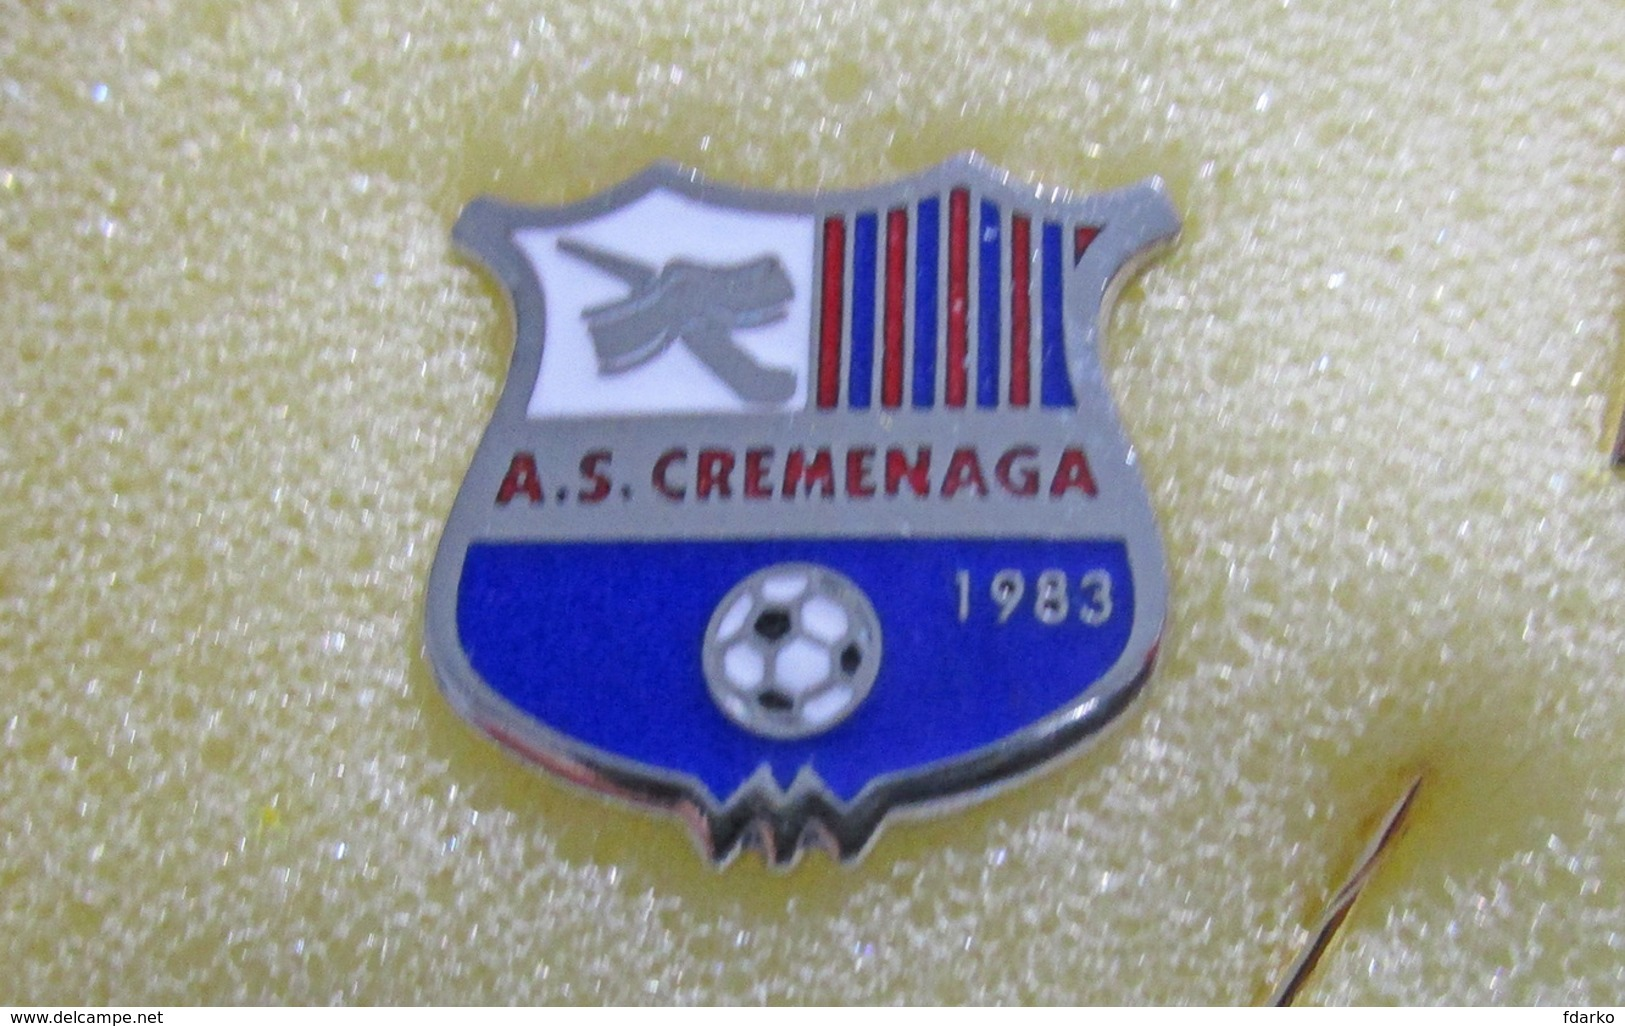 A.S. Cremenaga Varese Pins Calcio Lombardia Soccer Football Spilla Badgets Ufficiale - Calcio